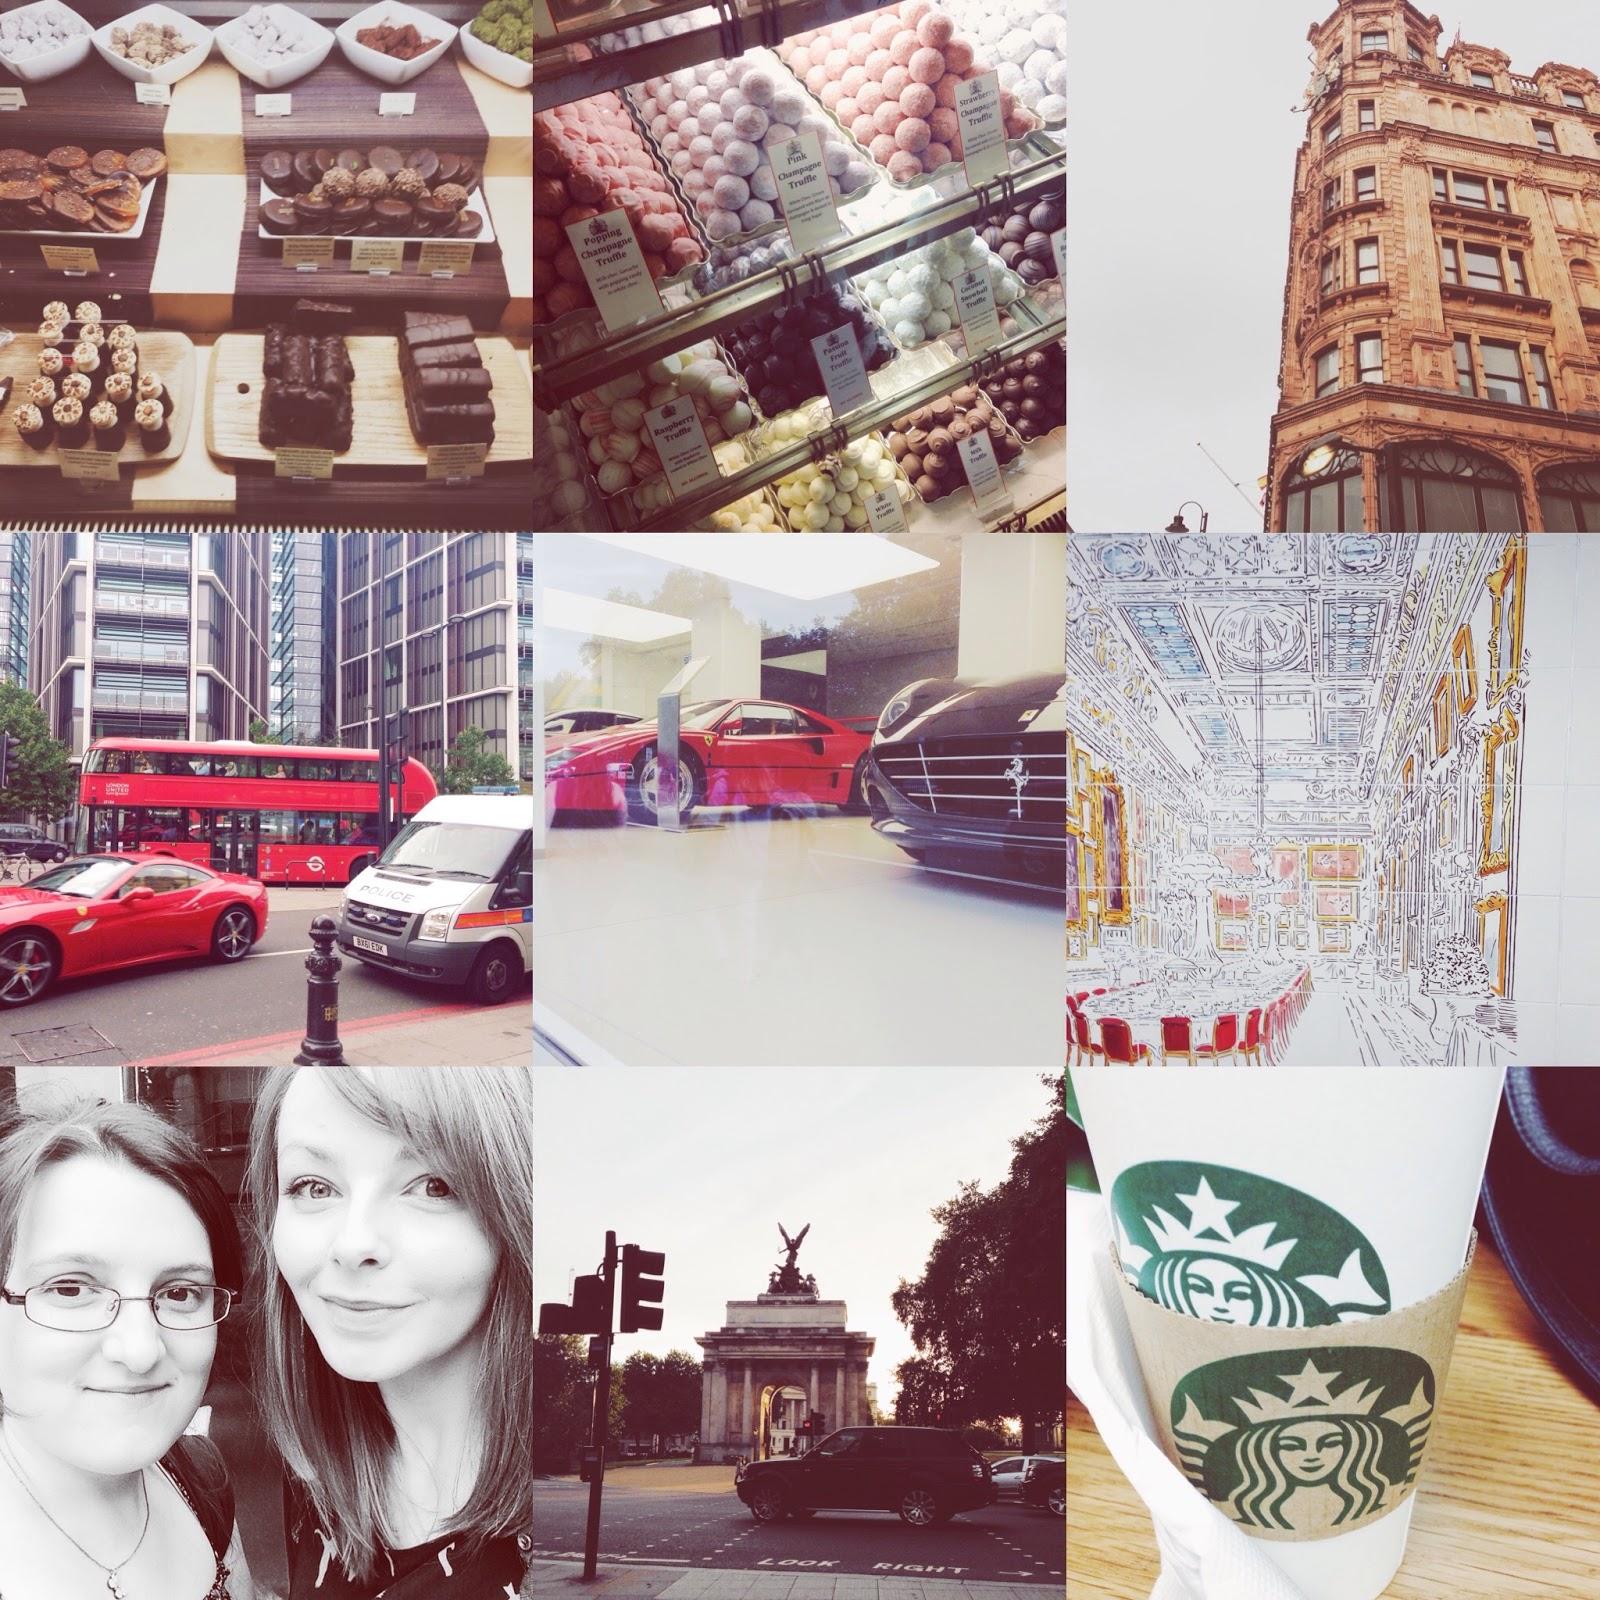 London Birthday Trip Sightseeing